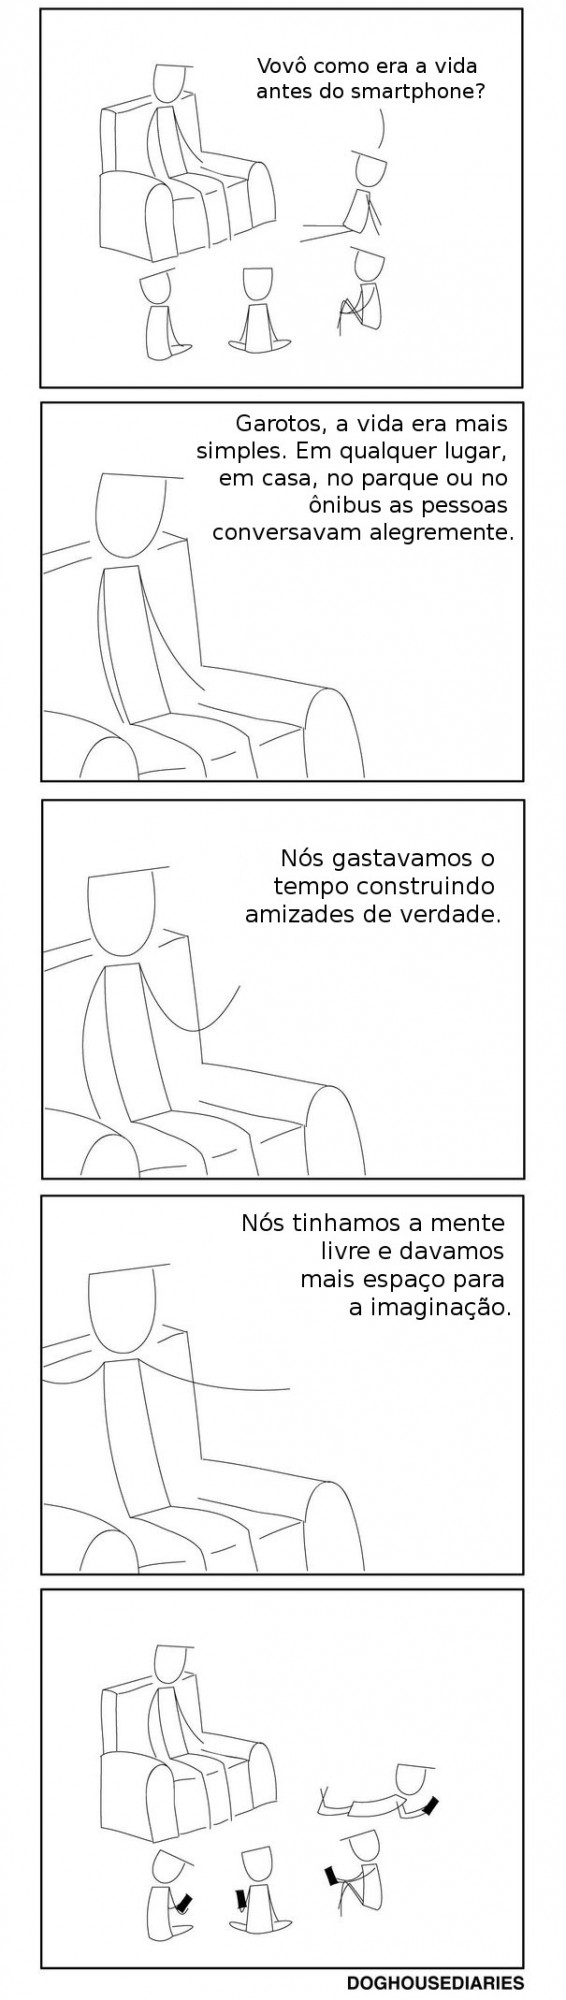 smartphone-addiction-illustrations-cartoons-22__605